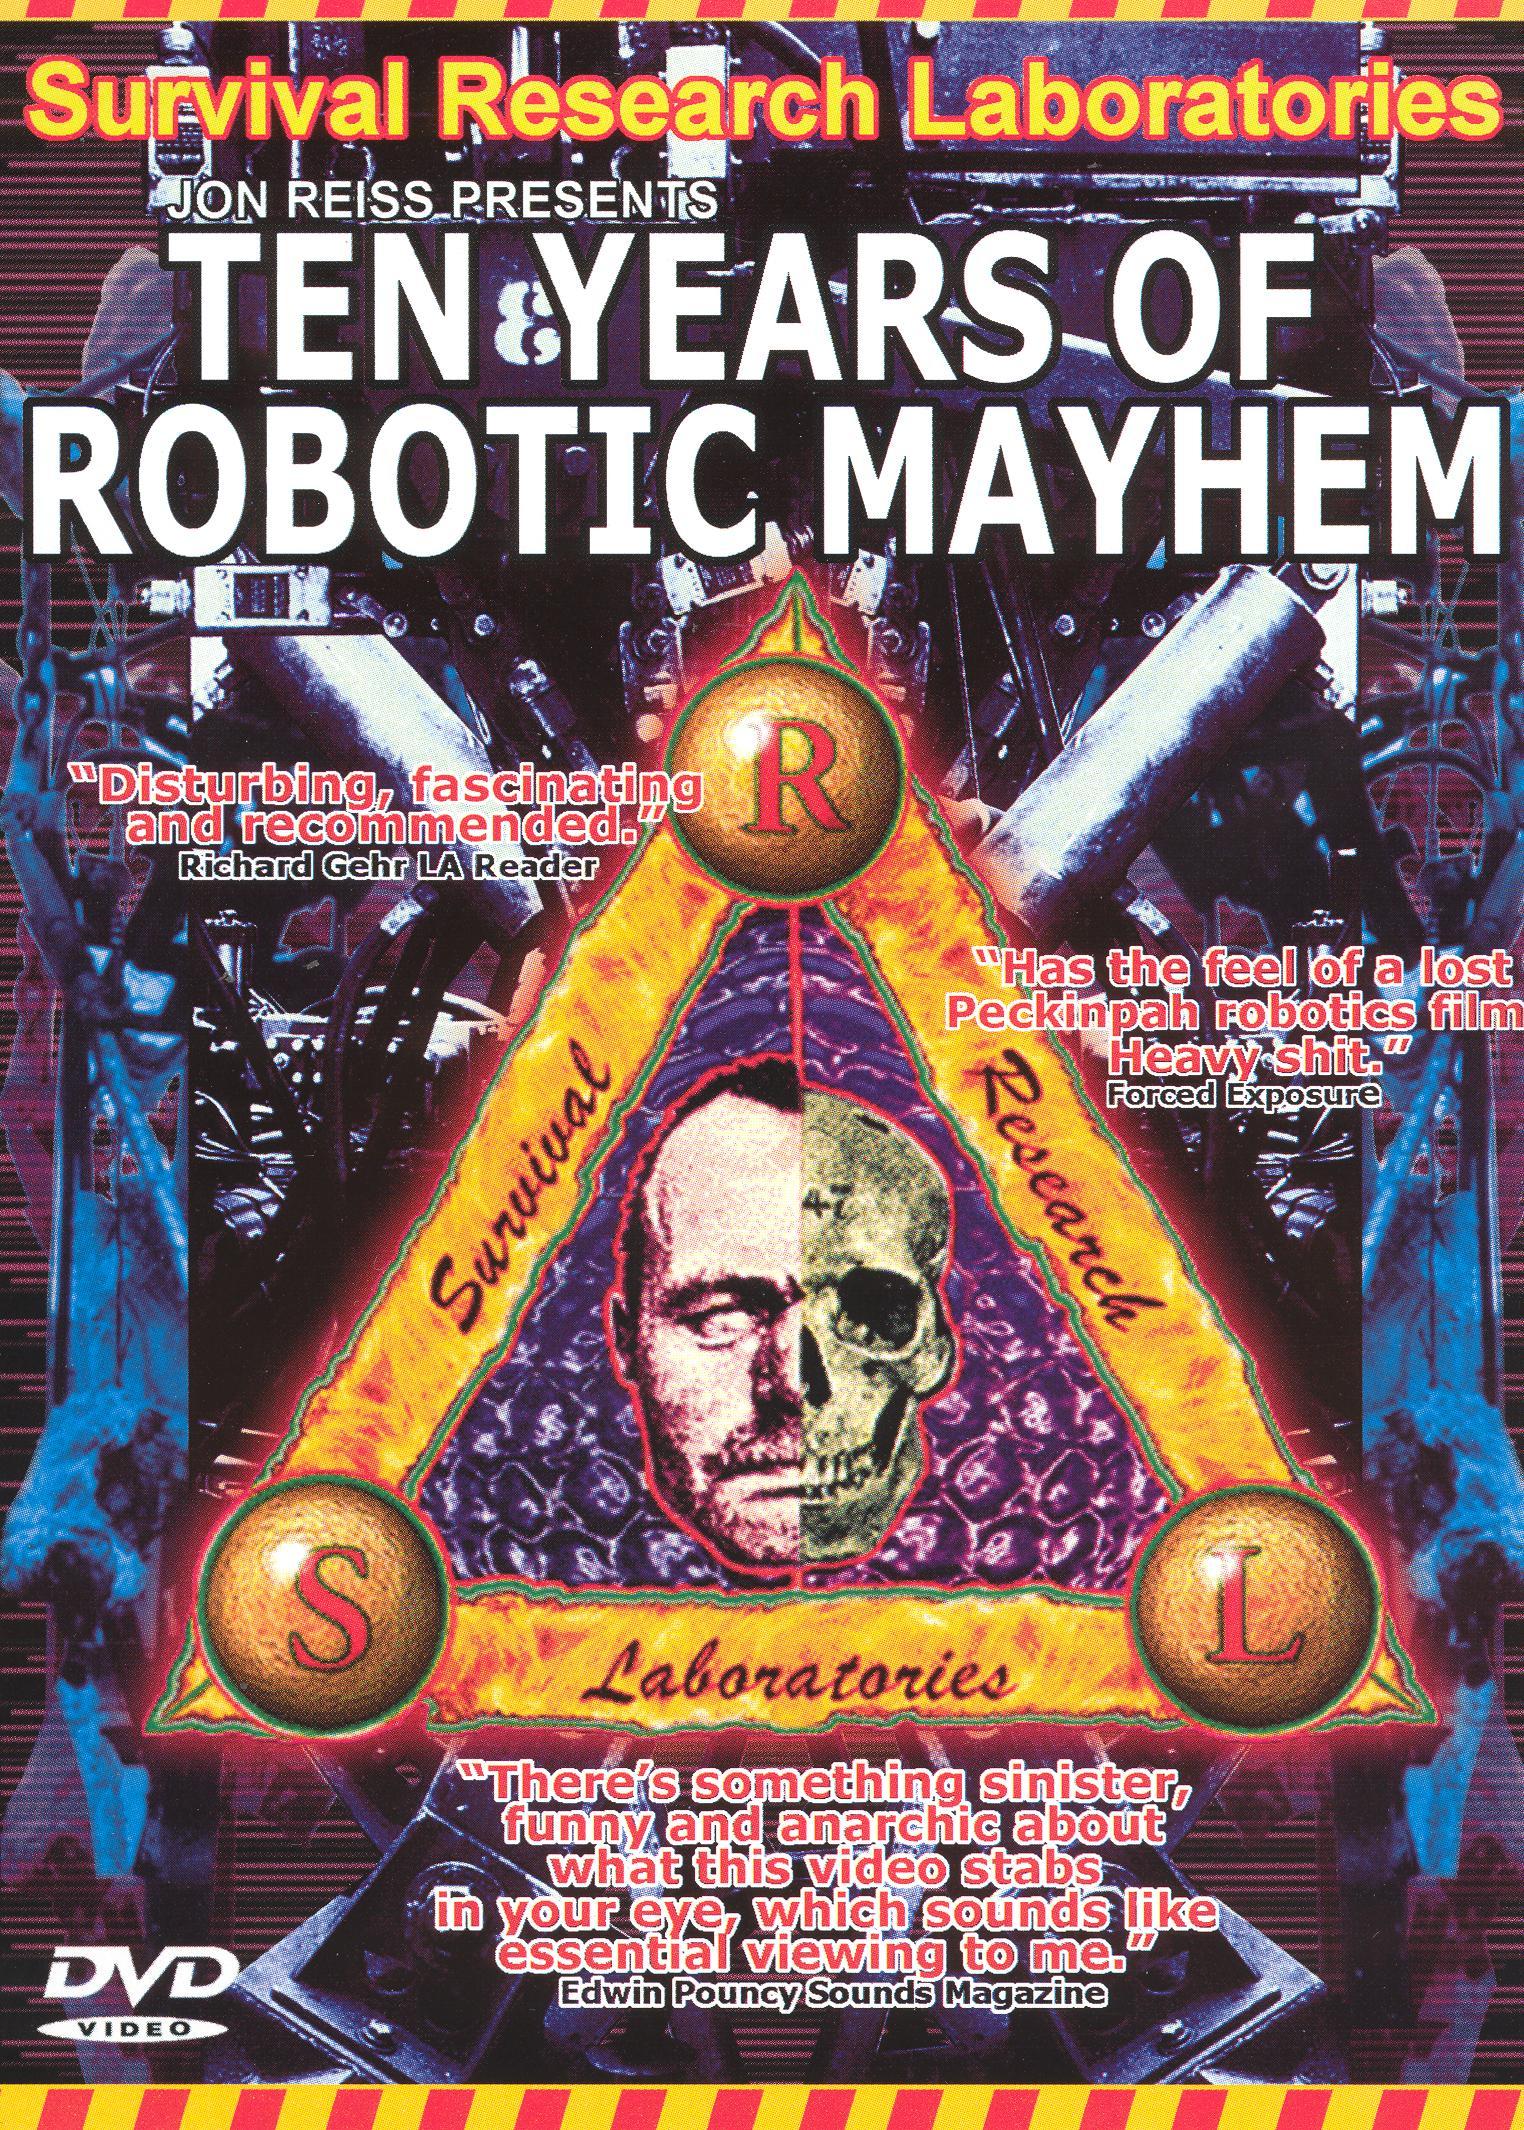 Survival Research Laboratories: Ten Years of Robotic Mayhem